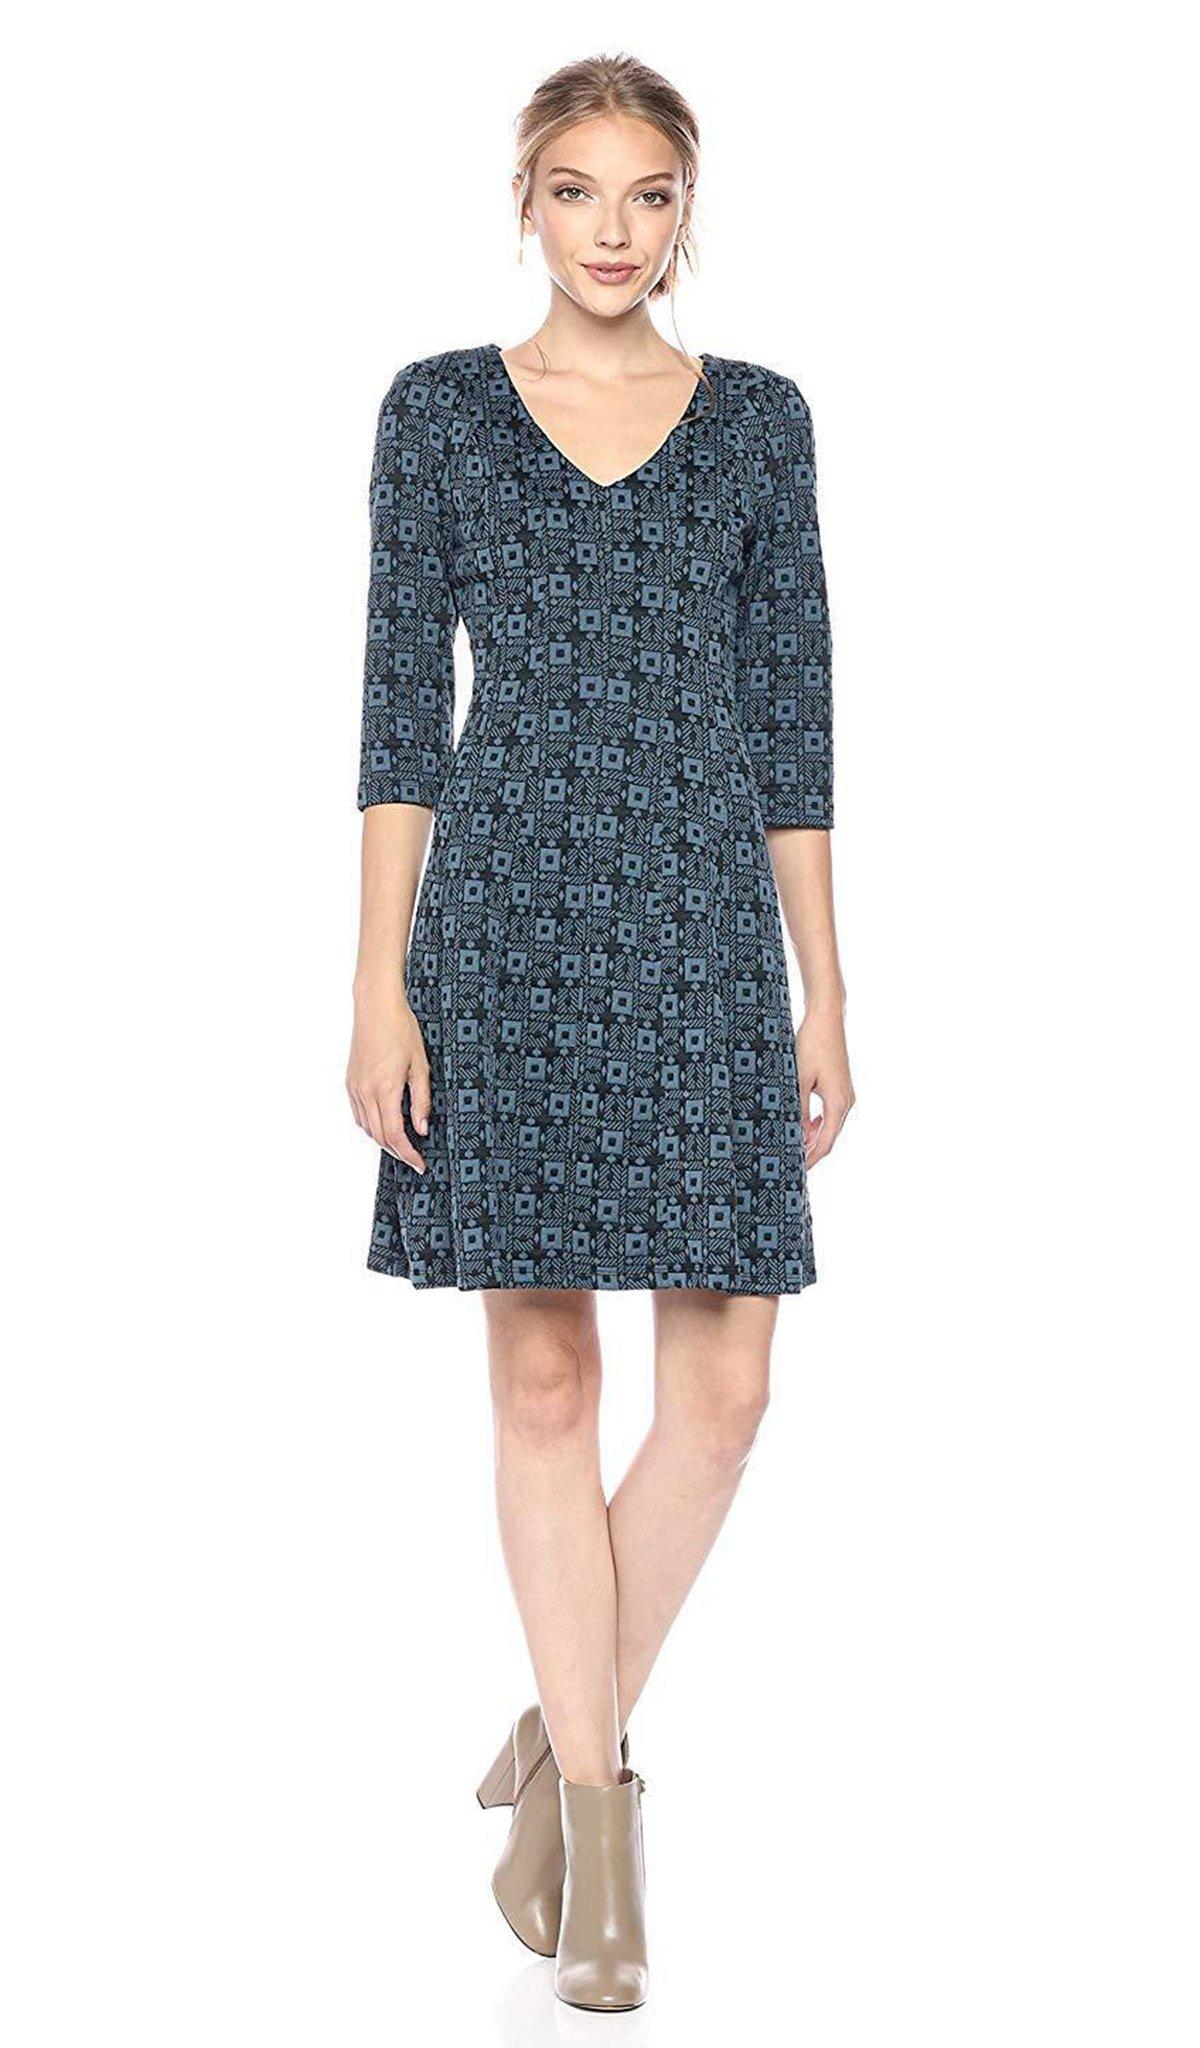 Taylor - 9209M V Neck Jacquard Quarter Length Sleeve Short Dress